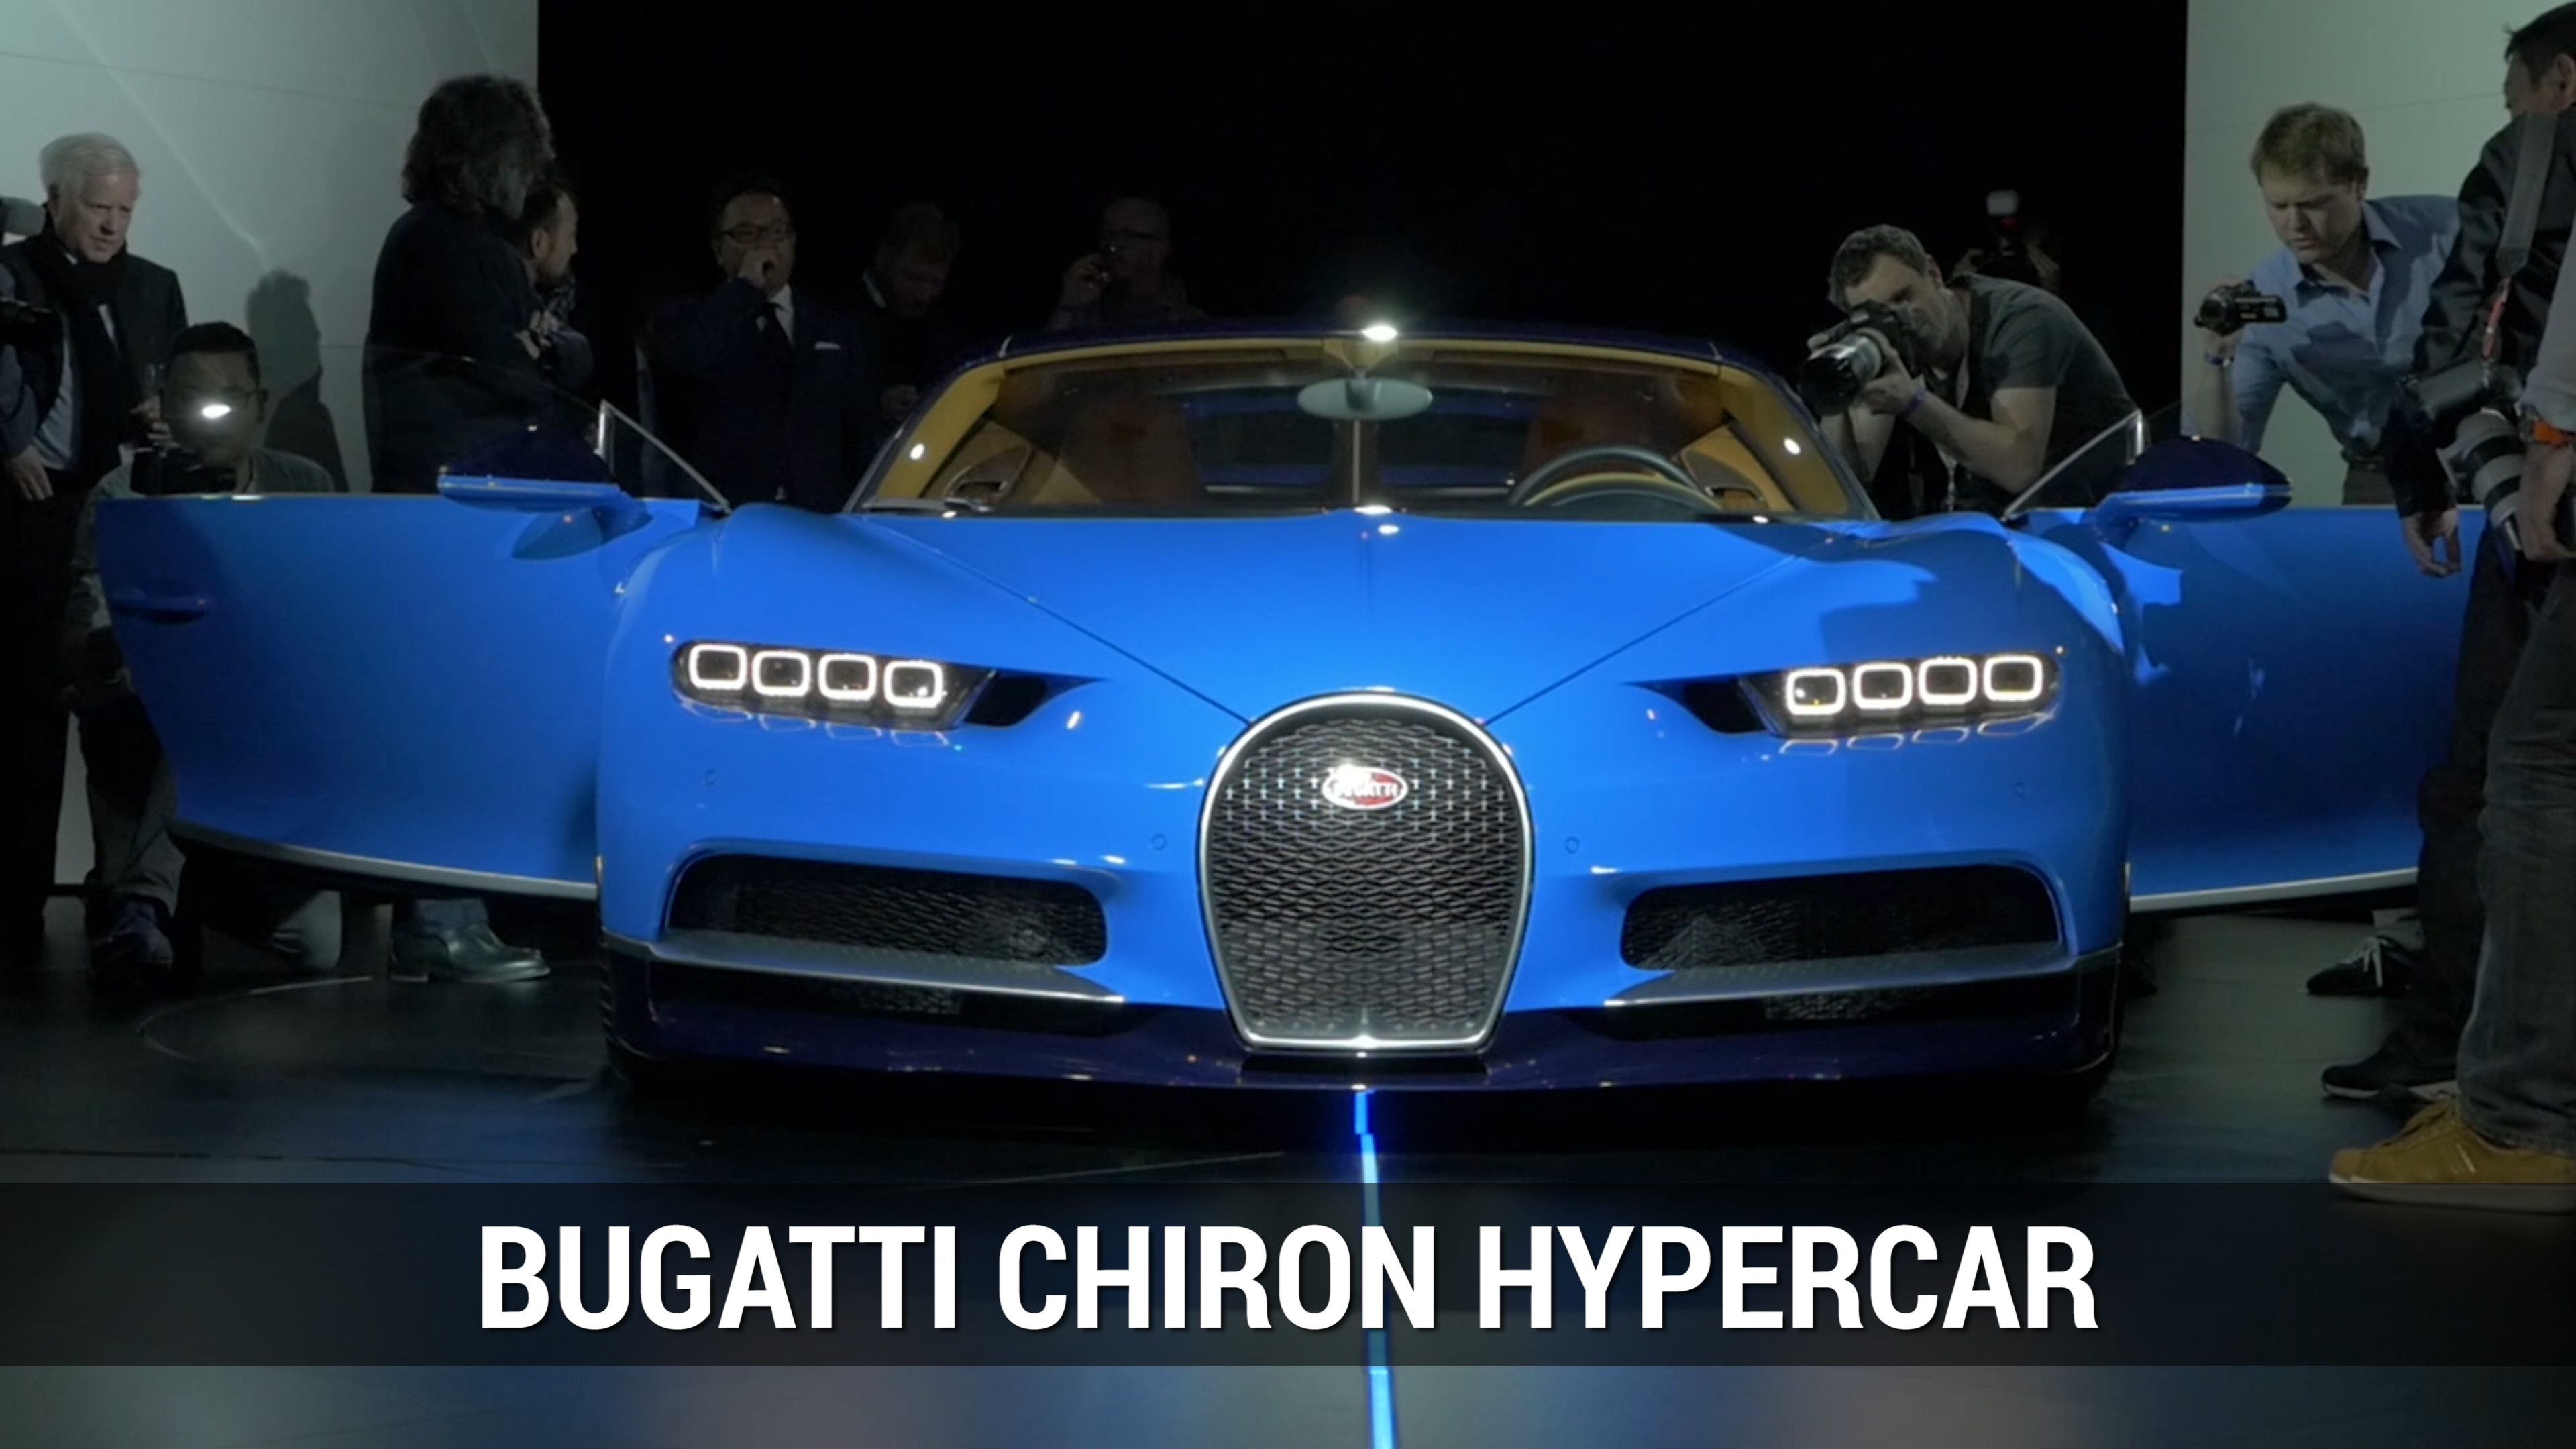 56d4d803e4b02dc36b5e0499_cv1 Extraordinary Bugatti Veyron Price List Philippines Cars Trend